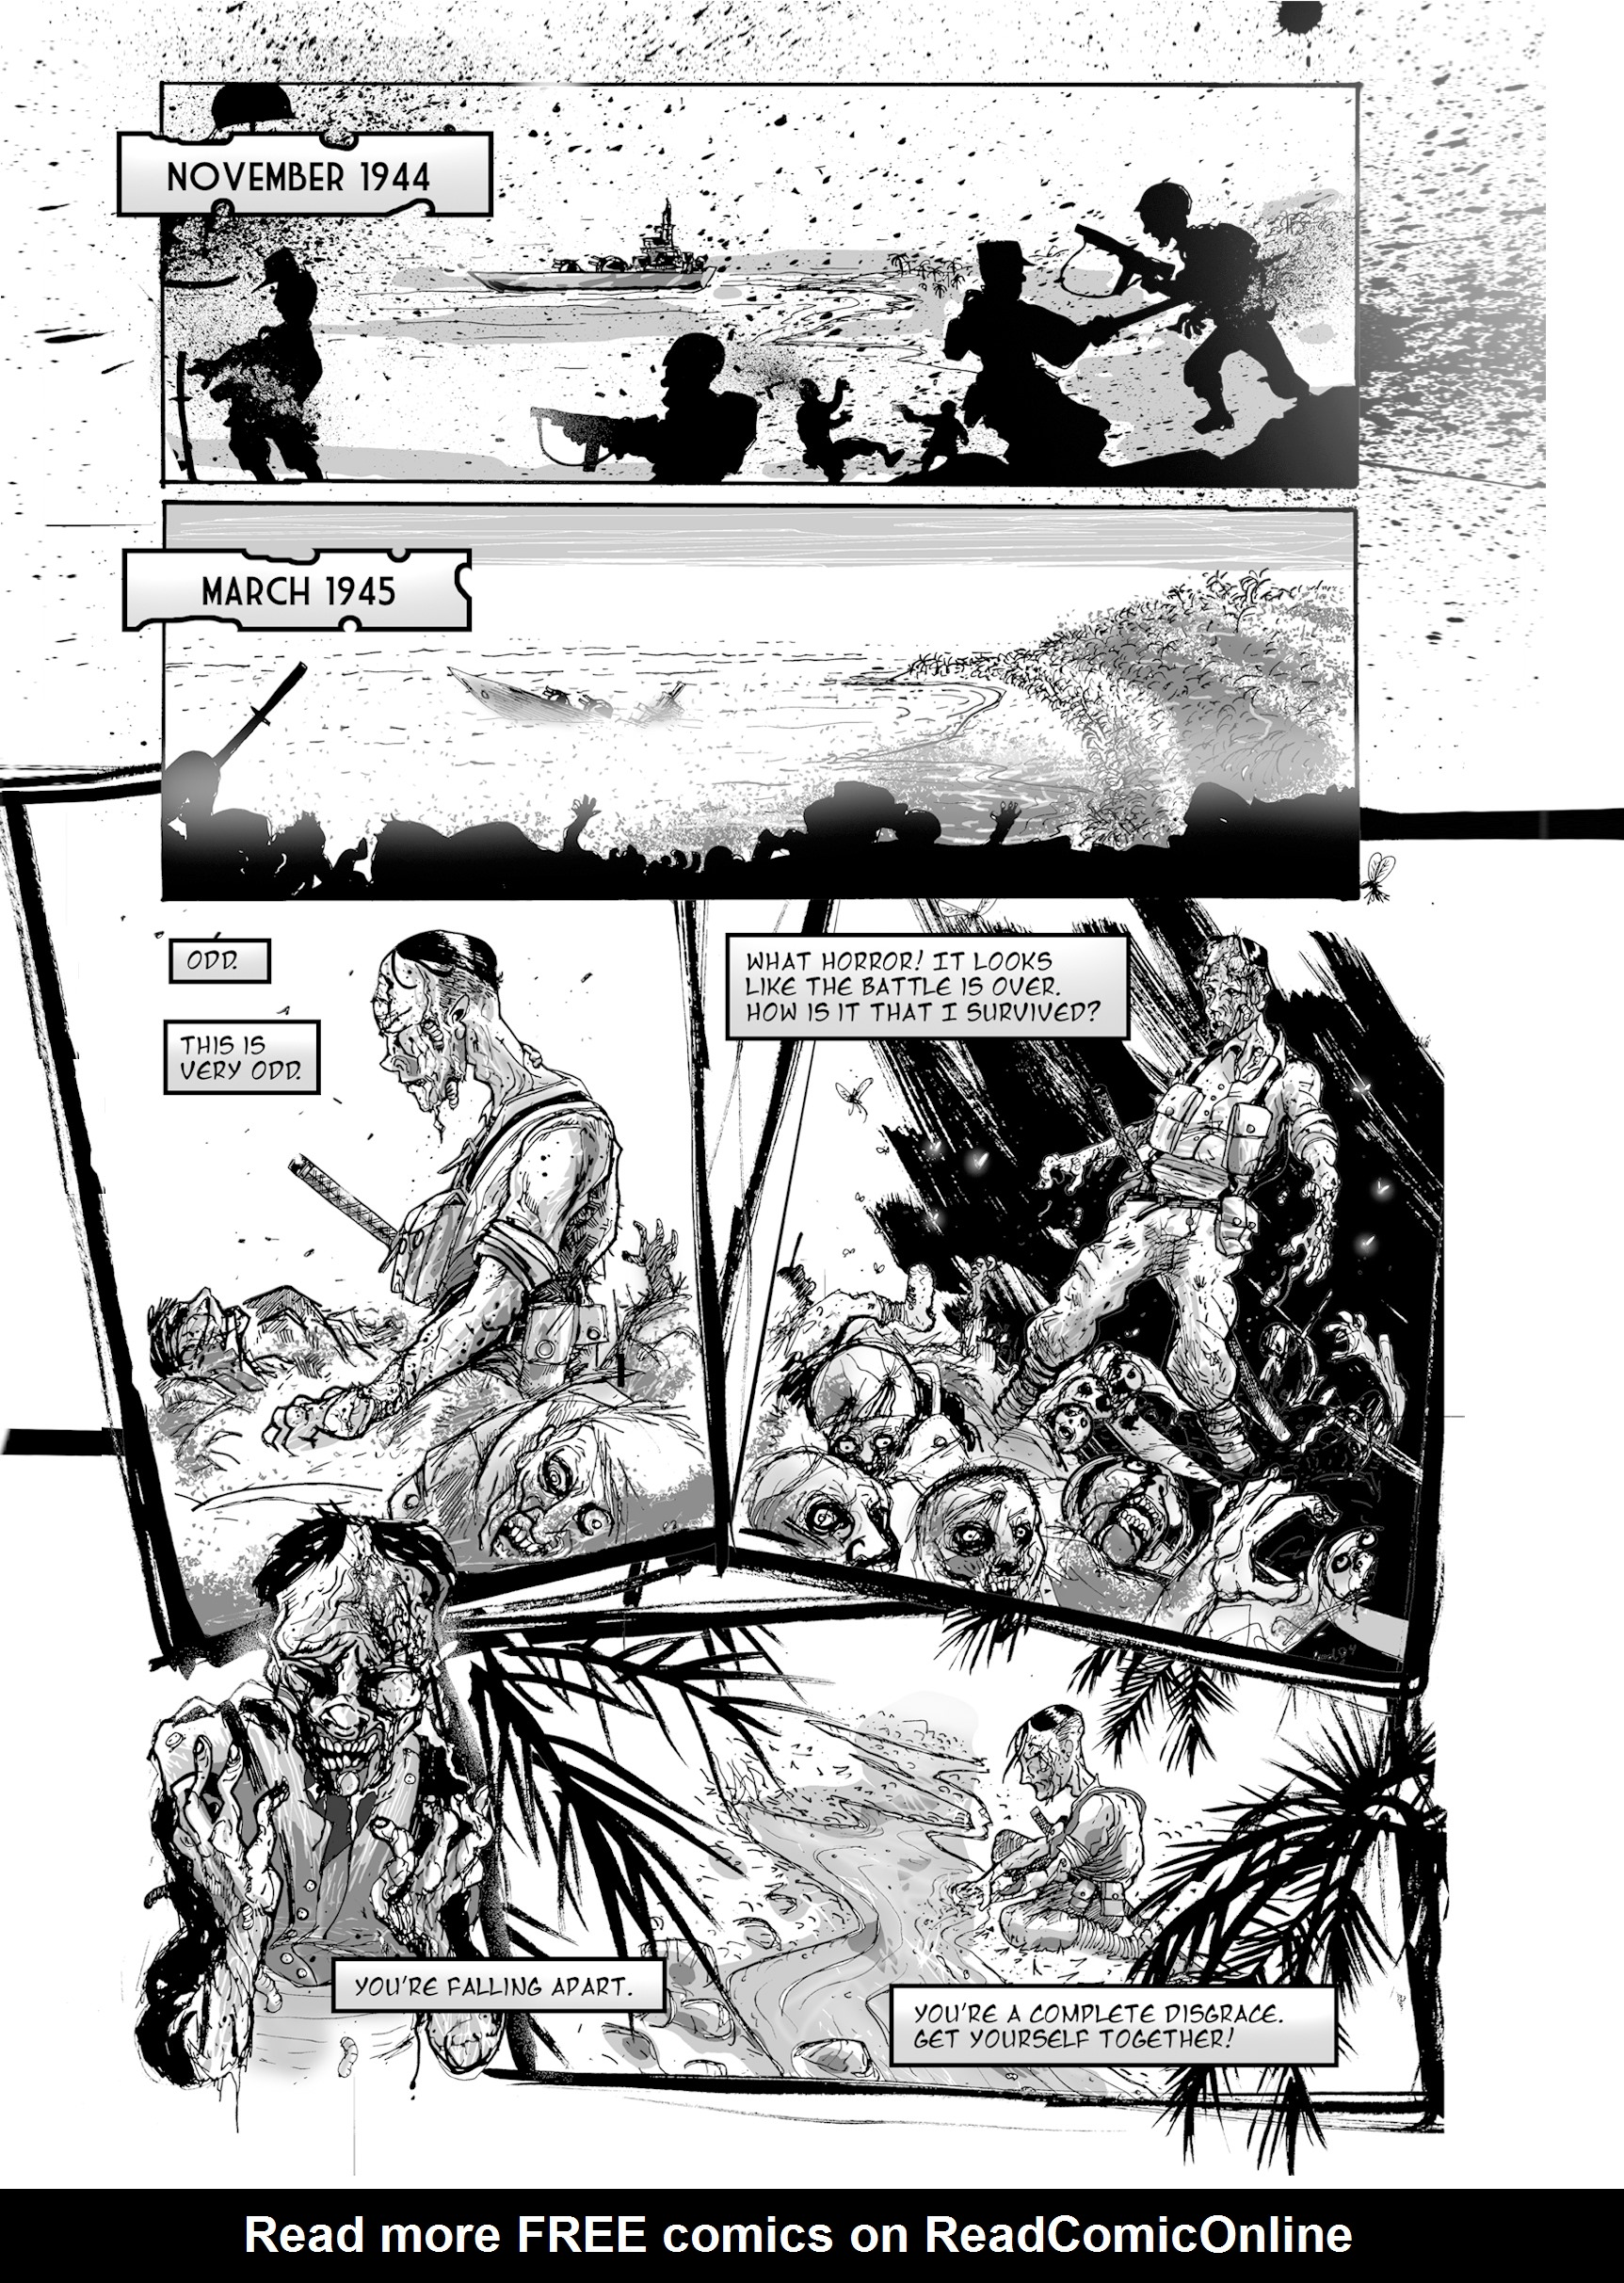 Read online FUBAR comic -  Issue #2 - 171